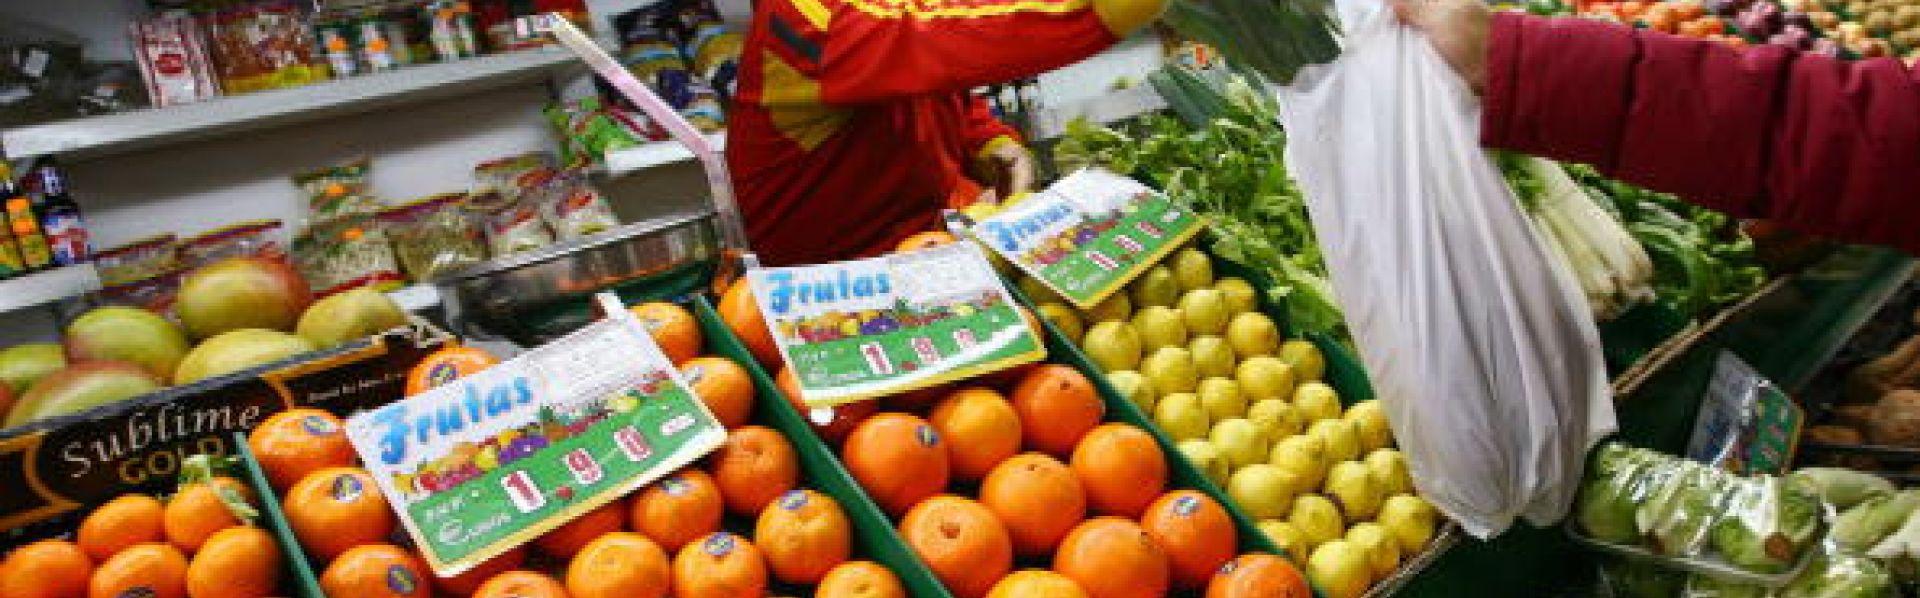 Food Prices' Upward Trend